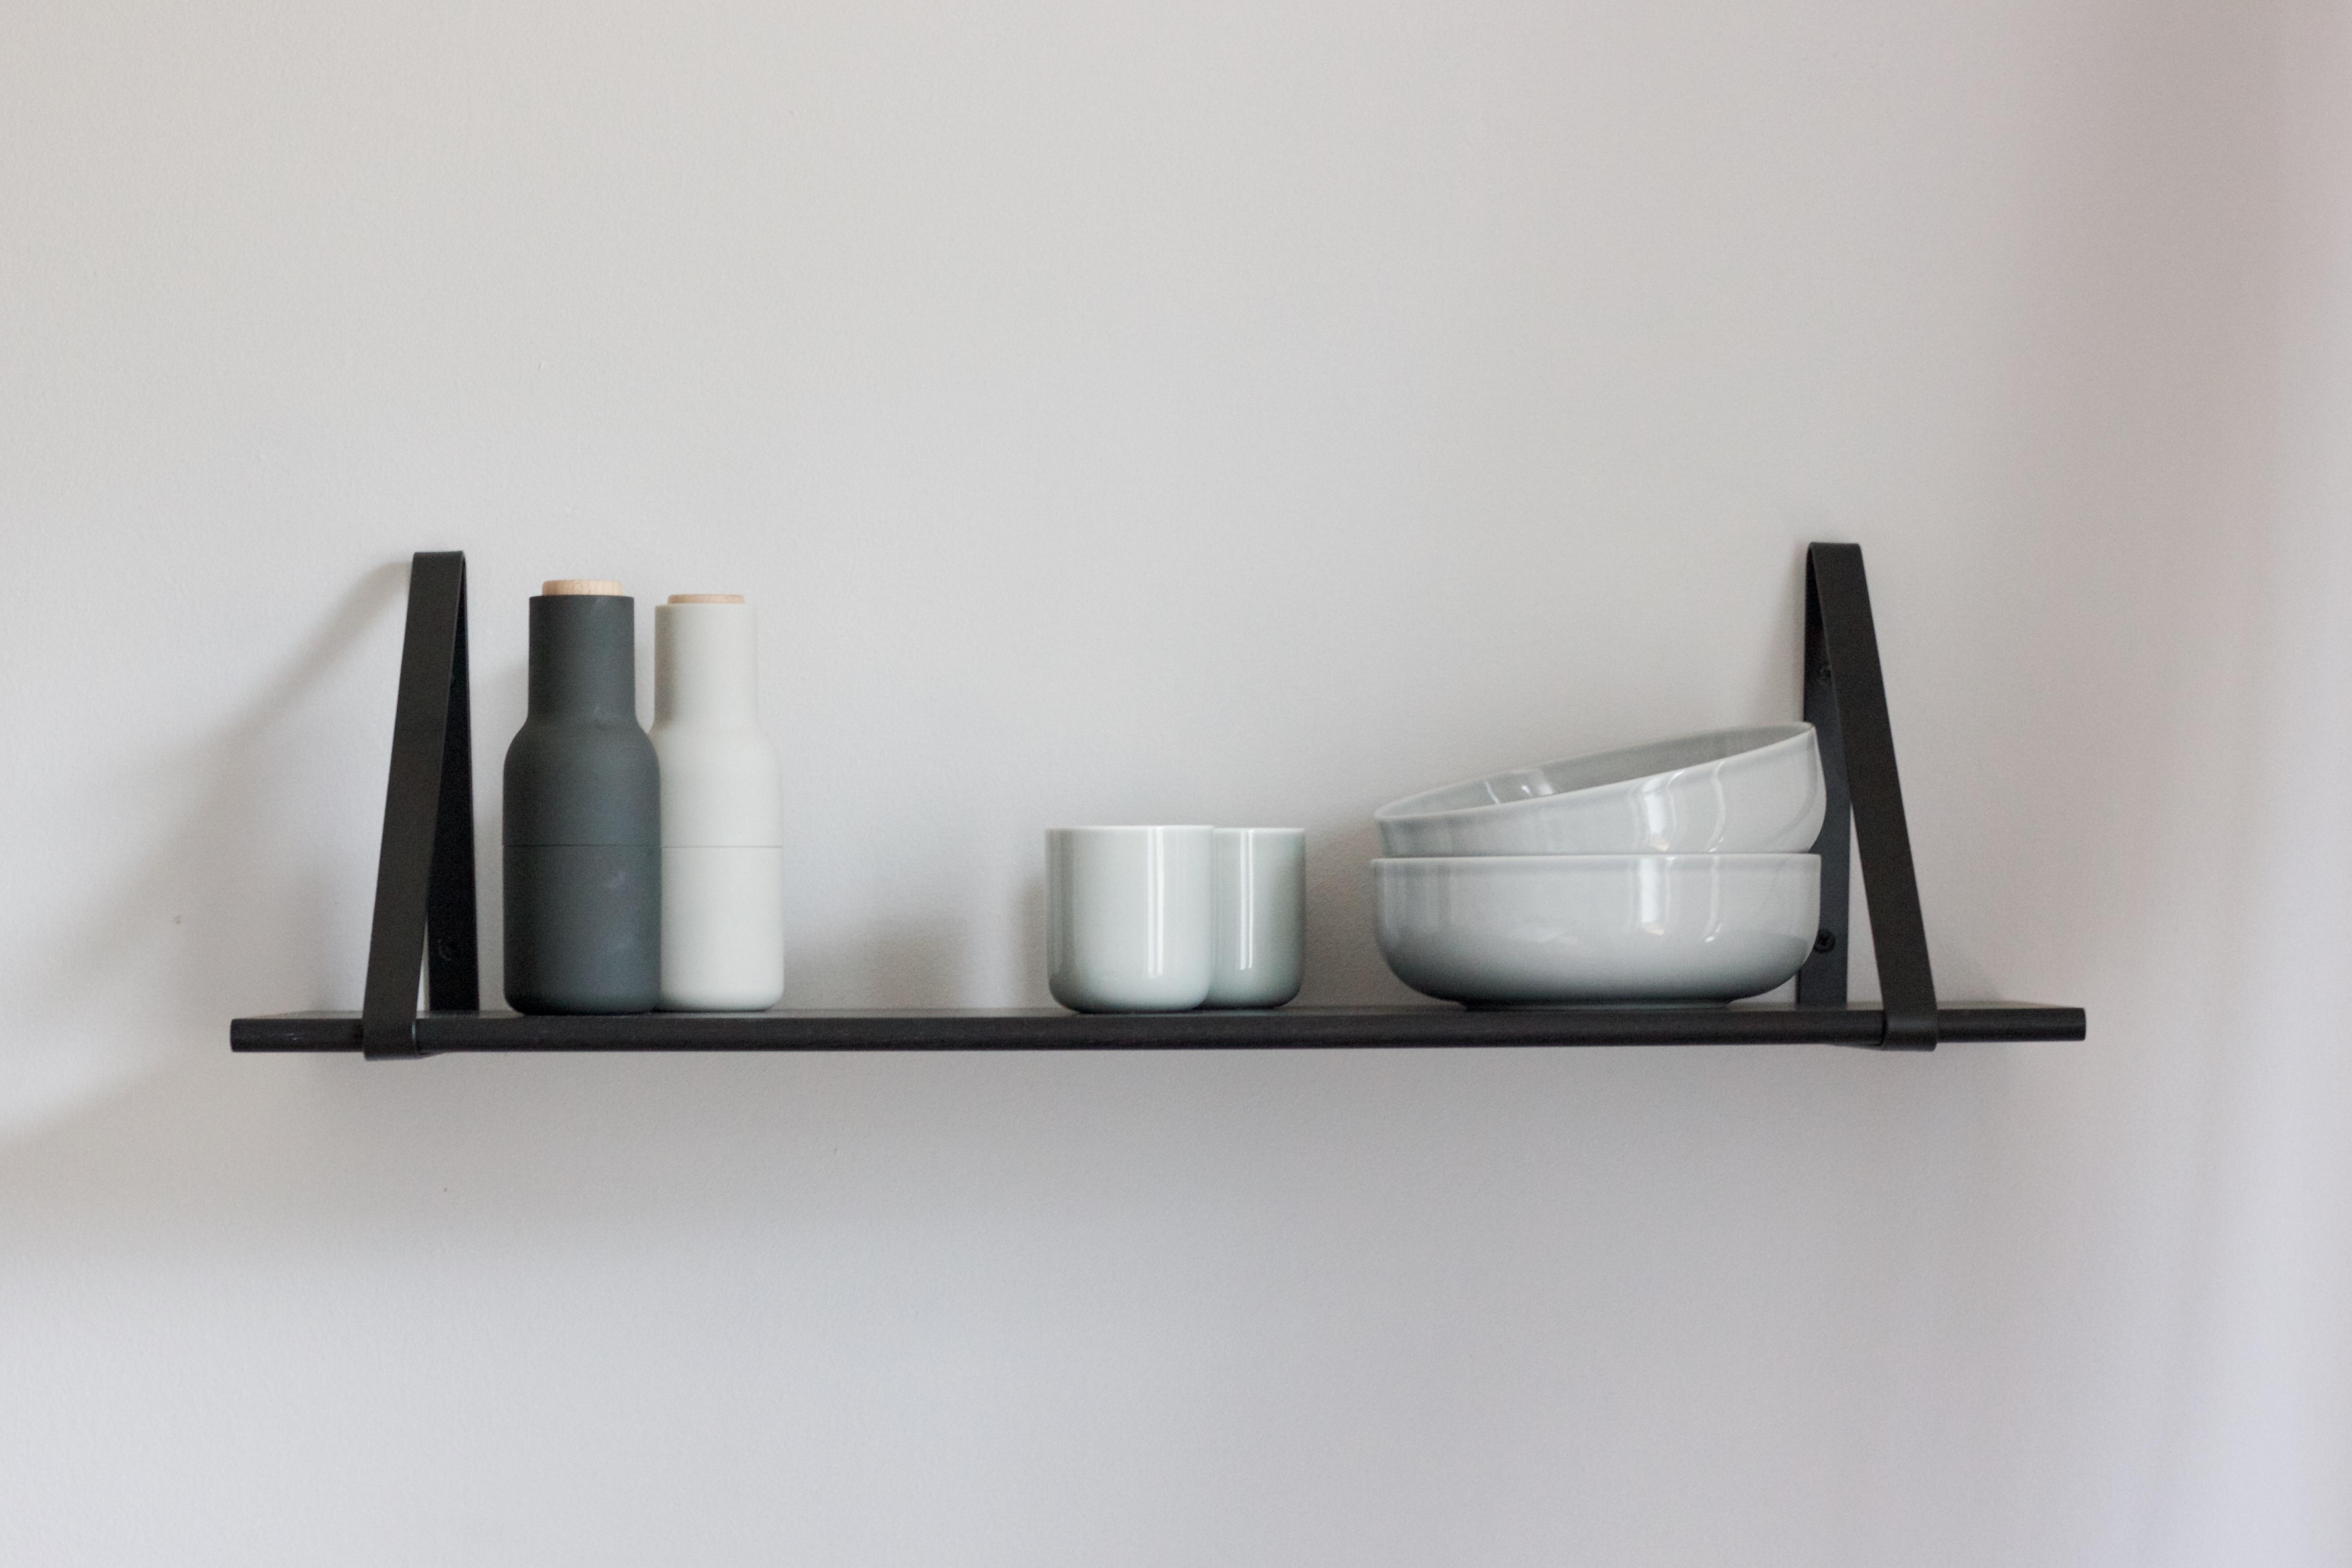 Beau Black Ferm Living Shelf From Connox